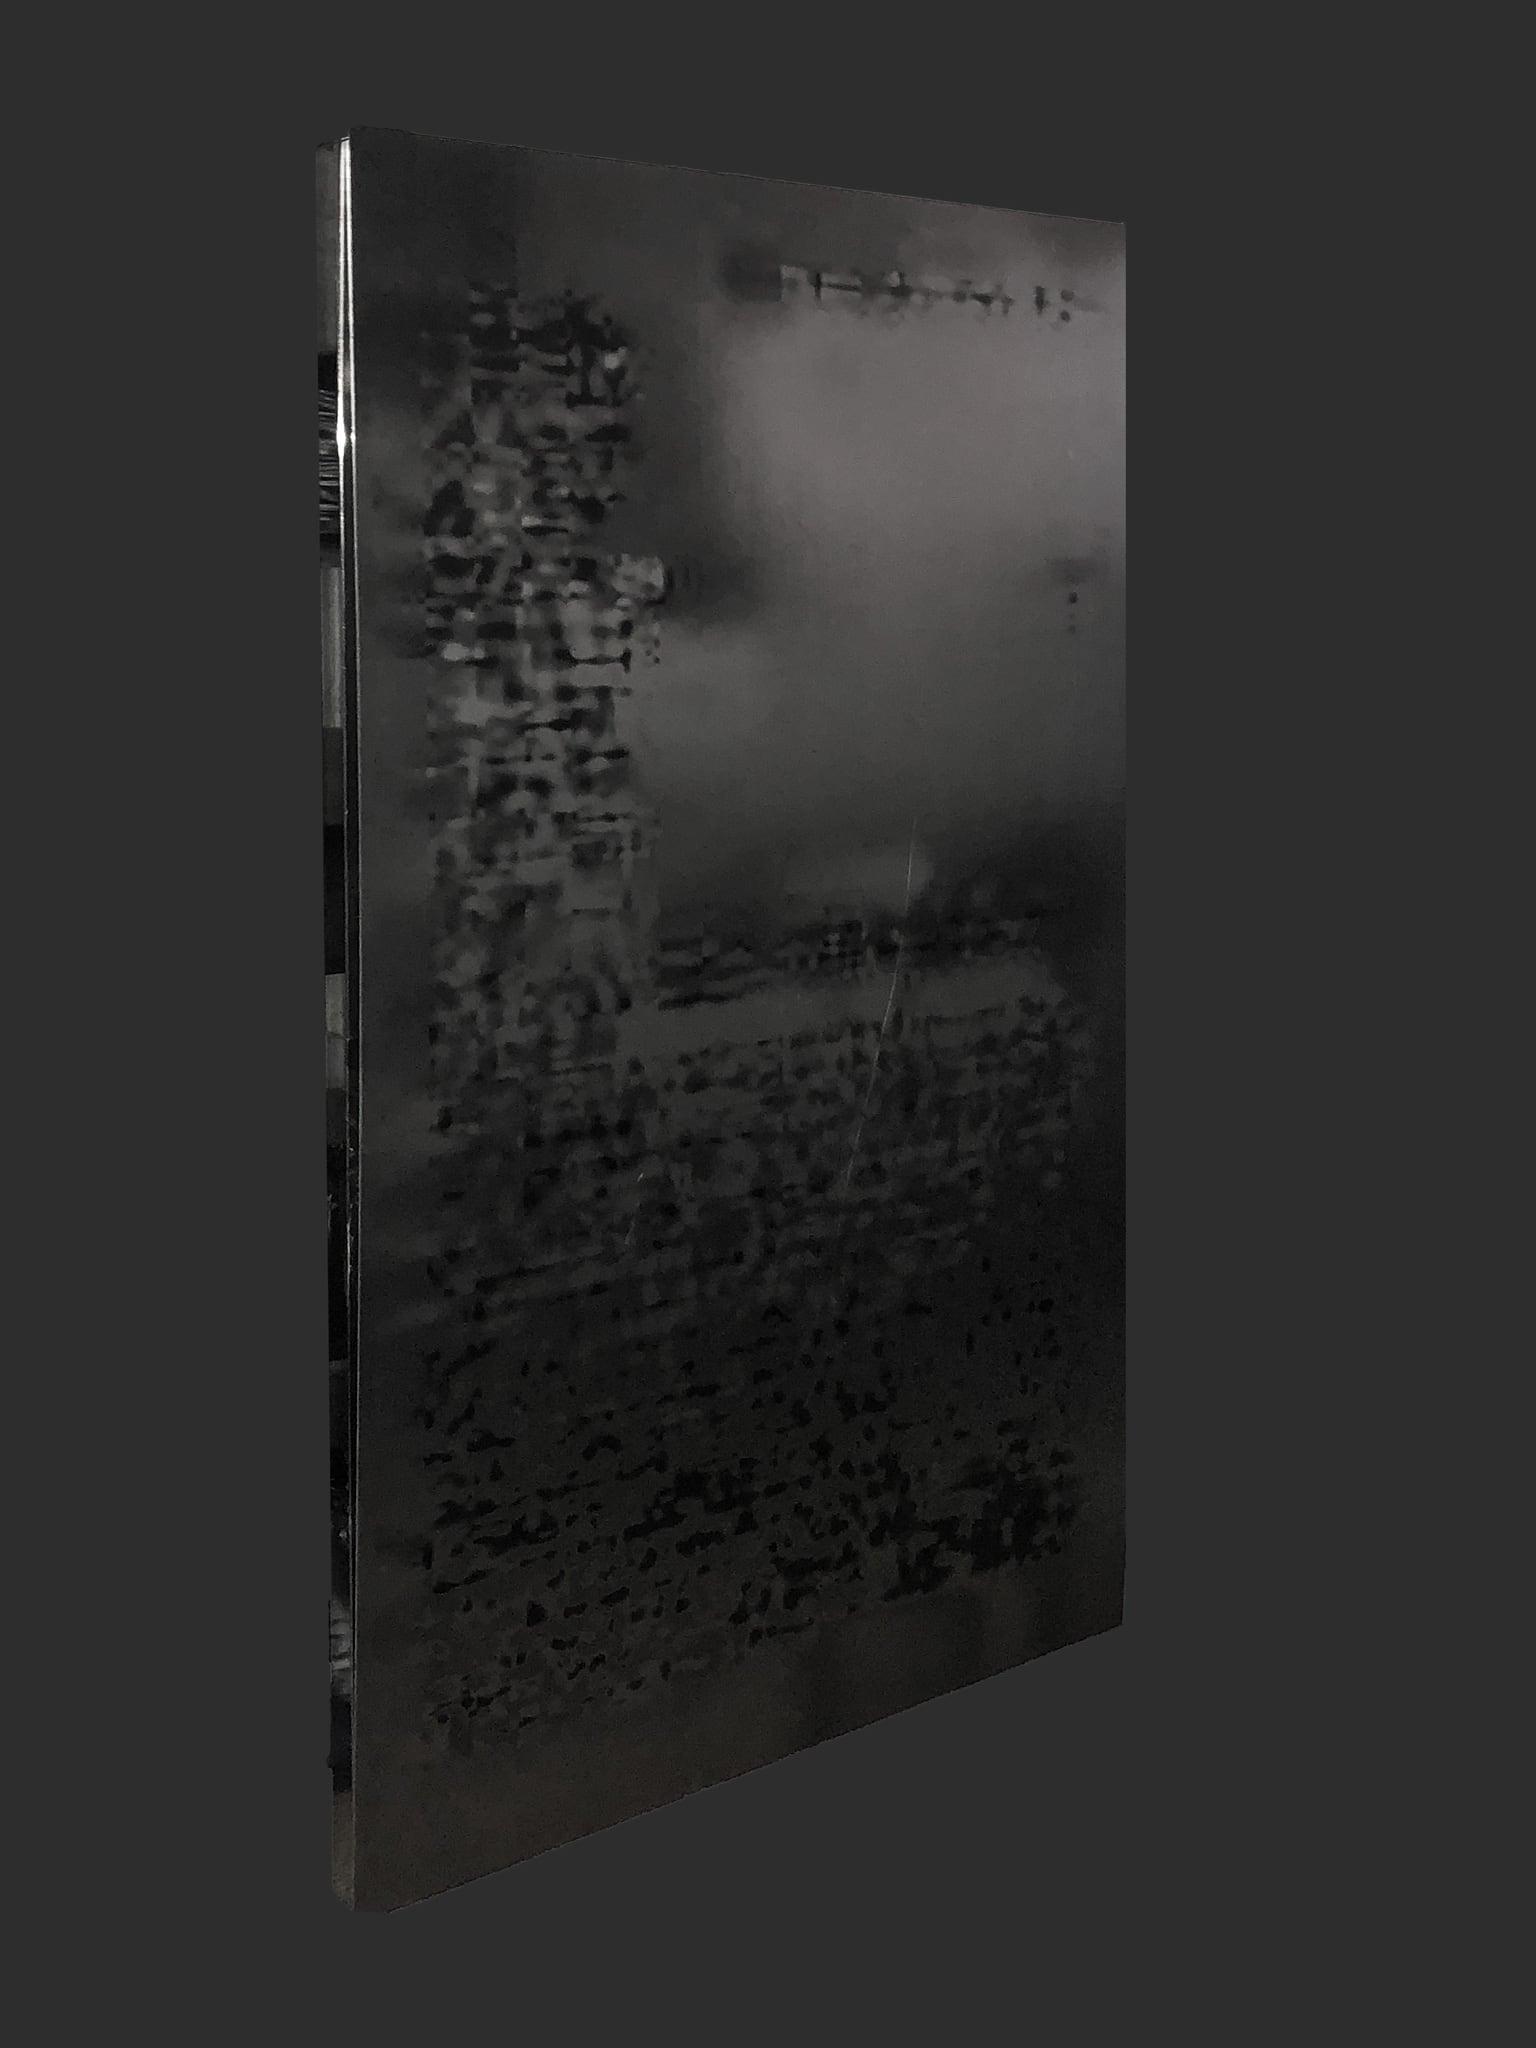 <p><i>Multispec</i> - Plated, 2020. UV Pigment Prints on Aluminum Plate, 1450 x 850mm. </p>